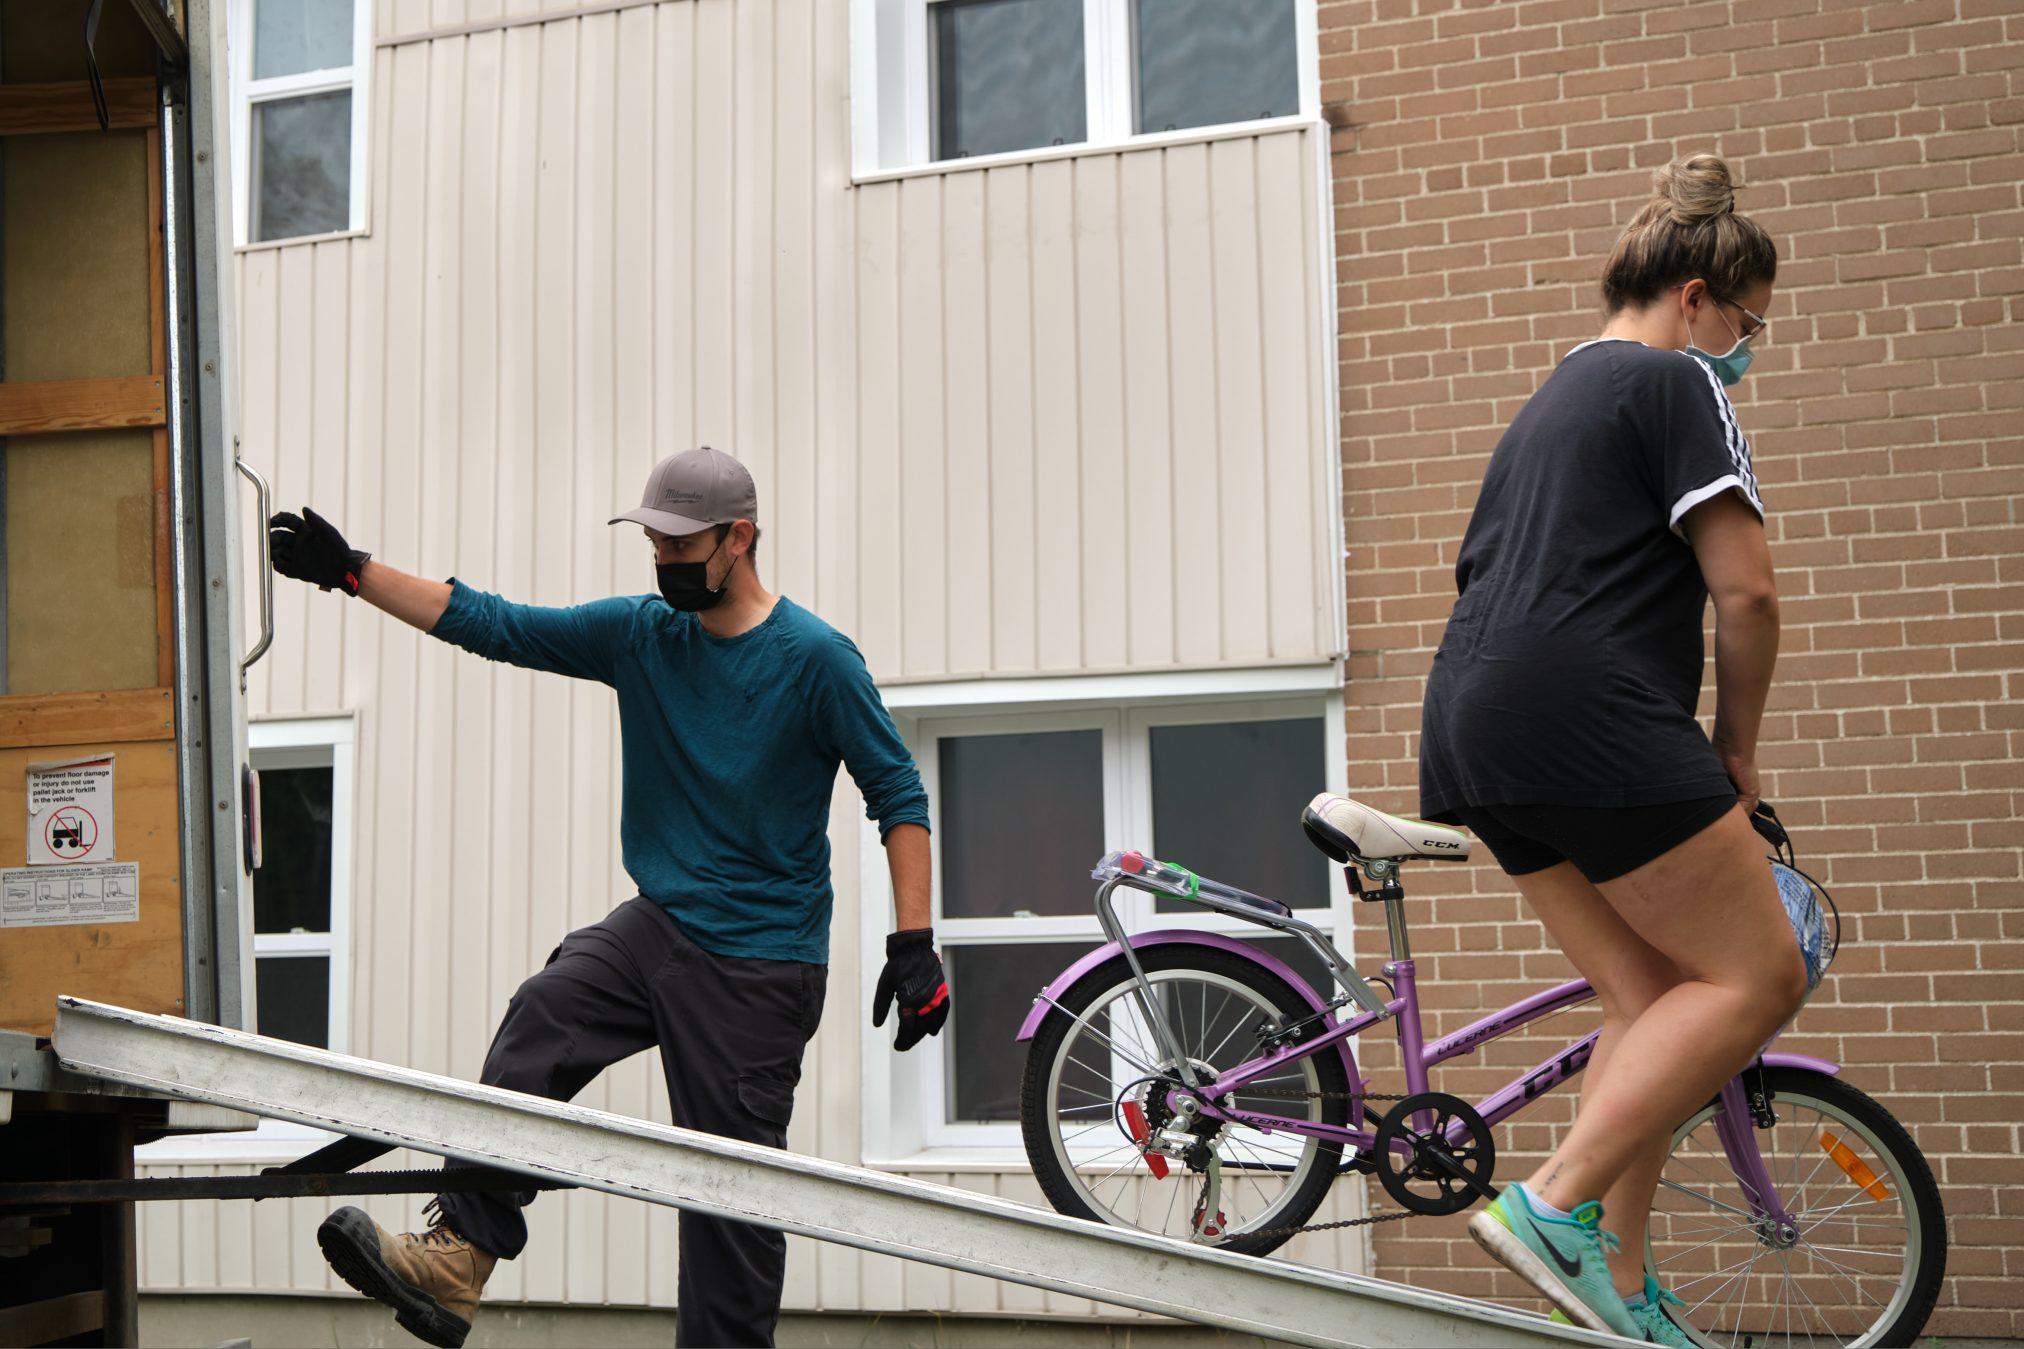 Volunteer movers unloading a truck